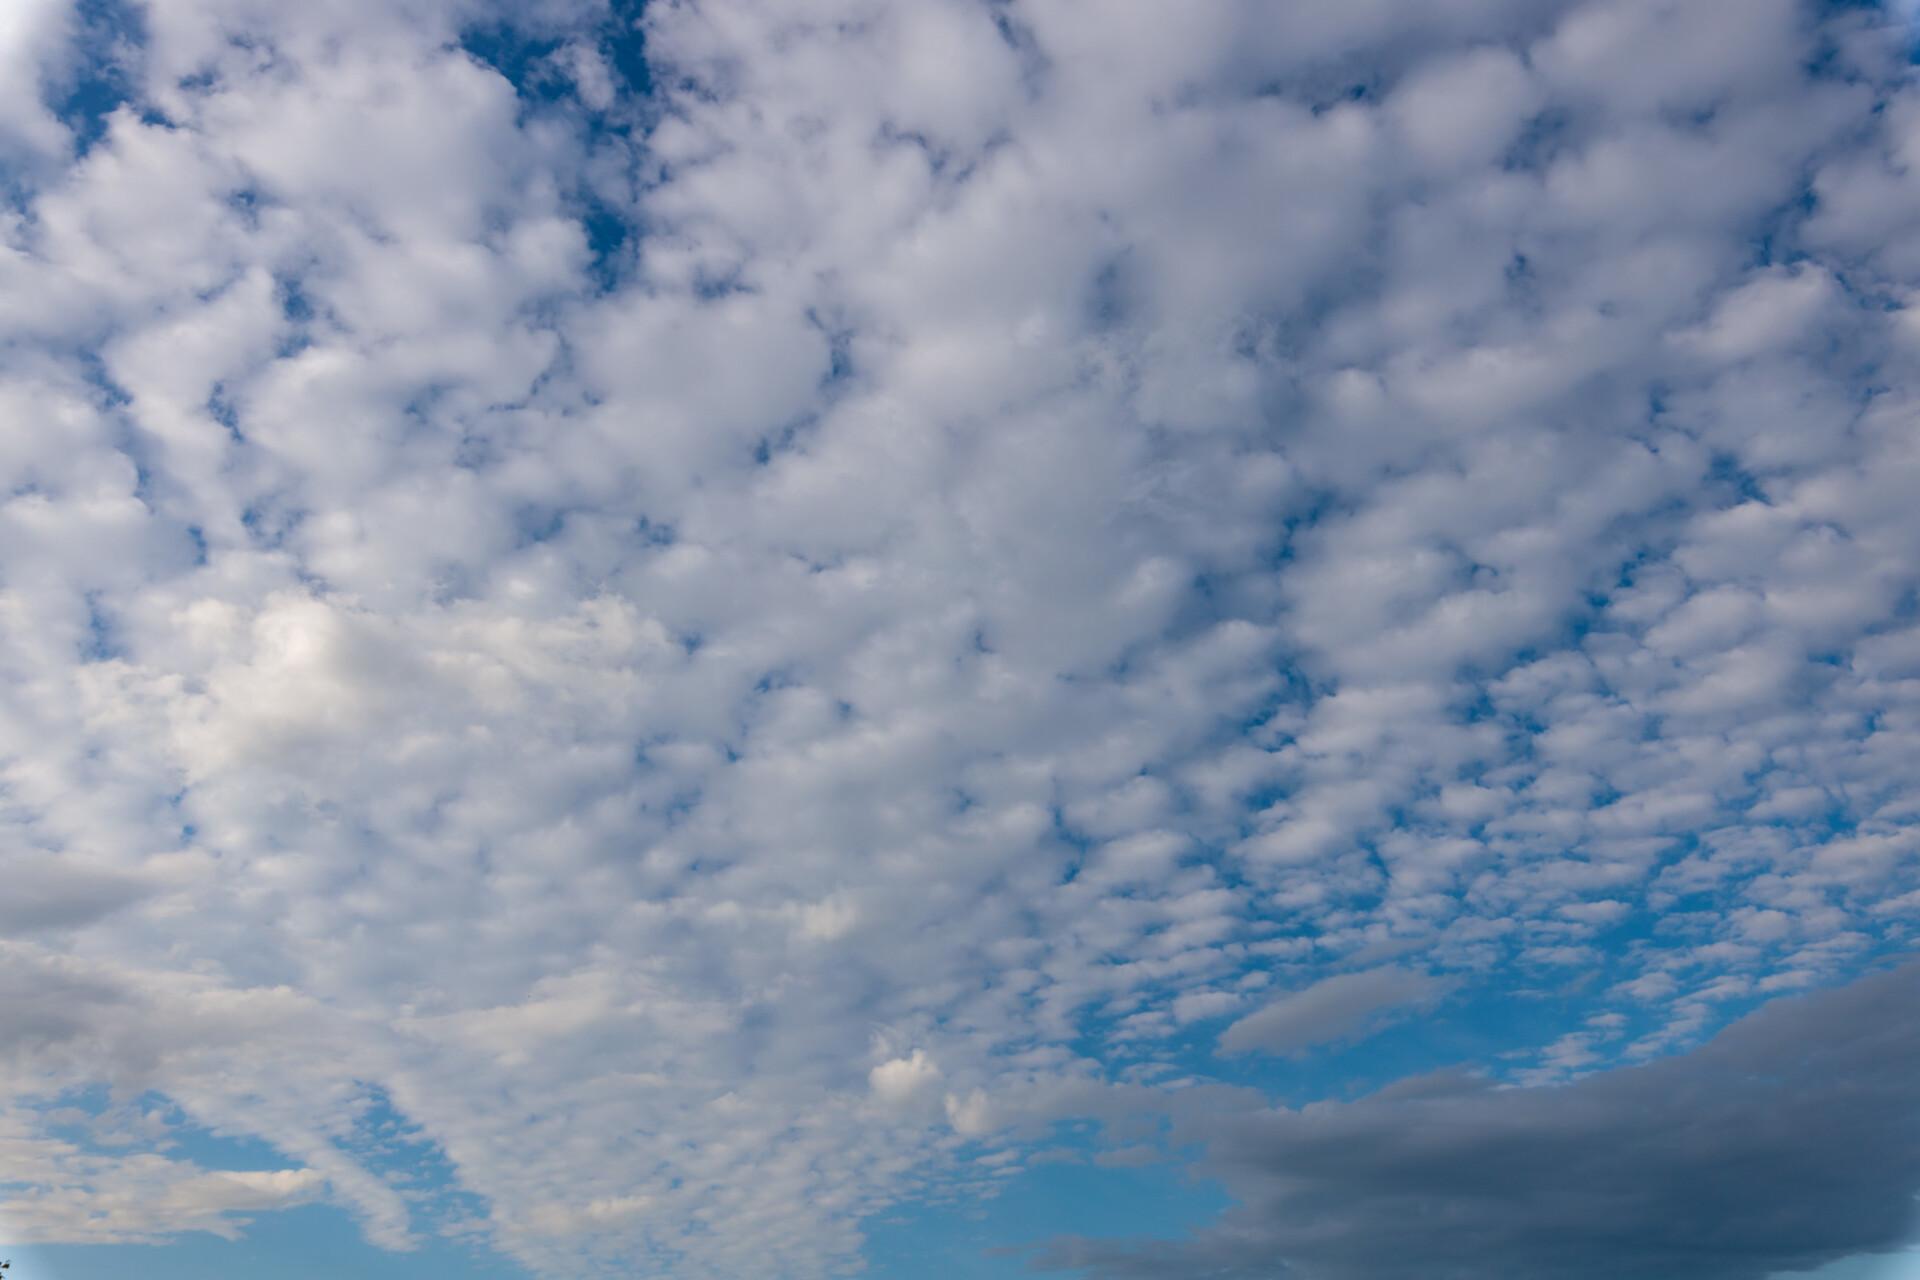 Beautiful carpet of clouds in the sky